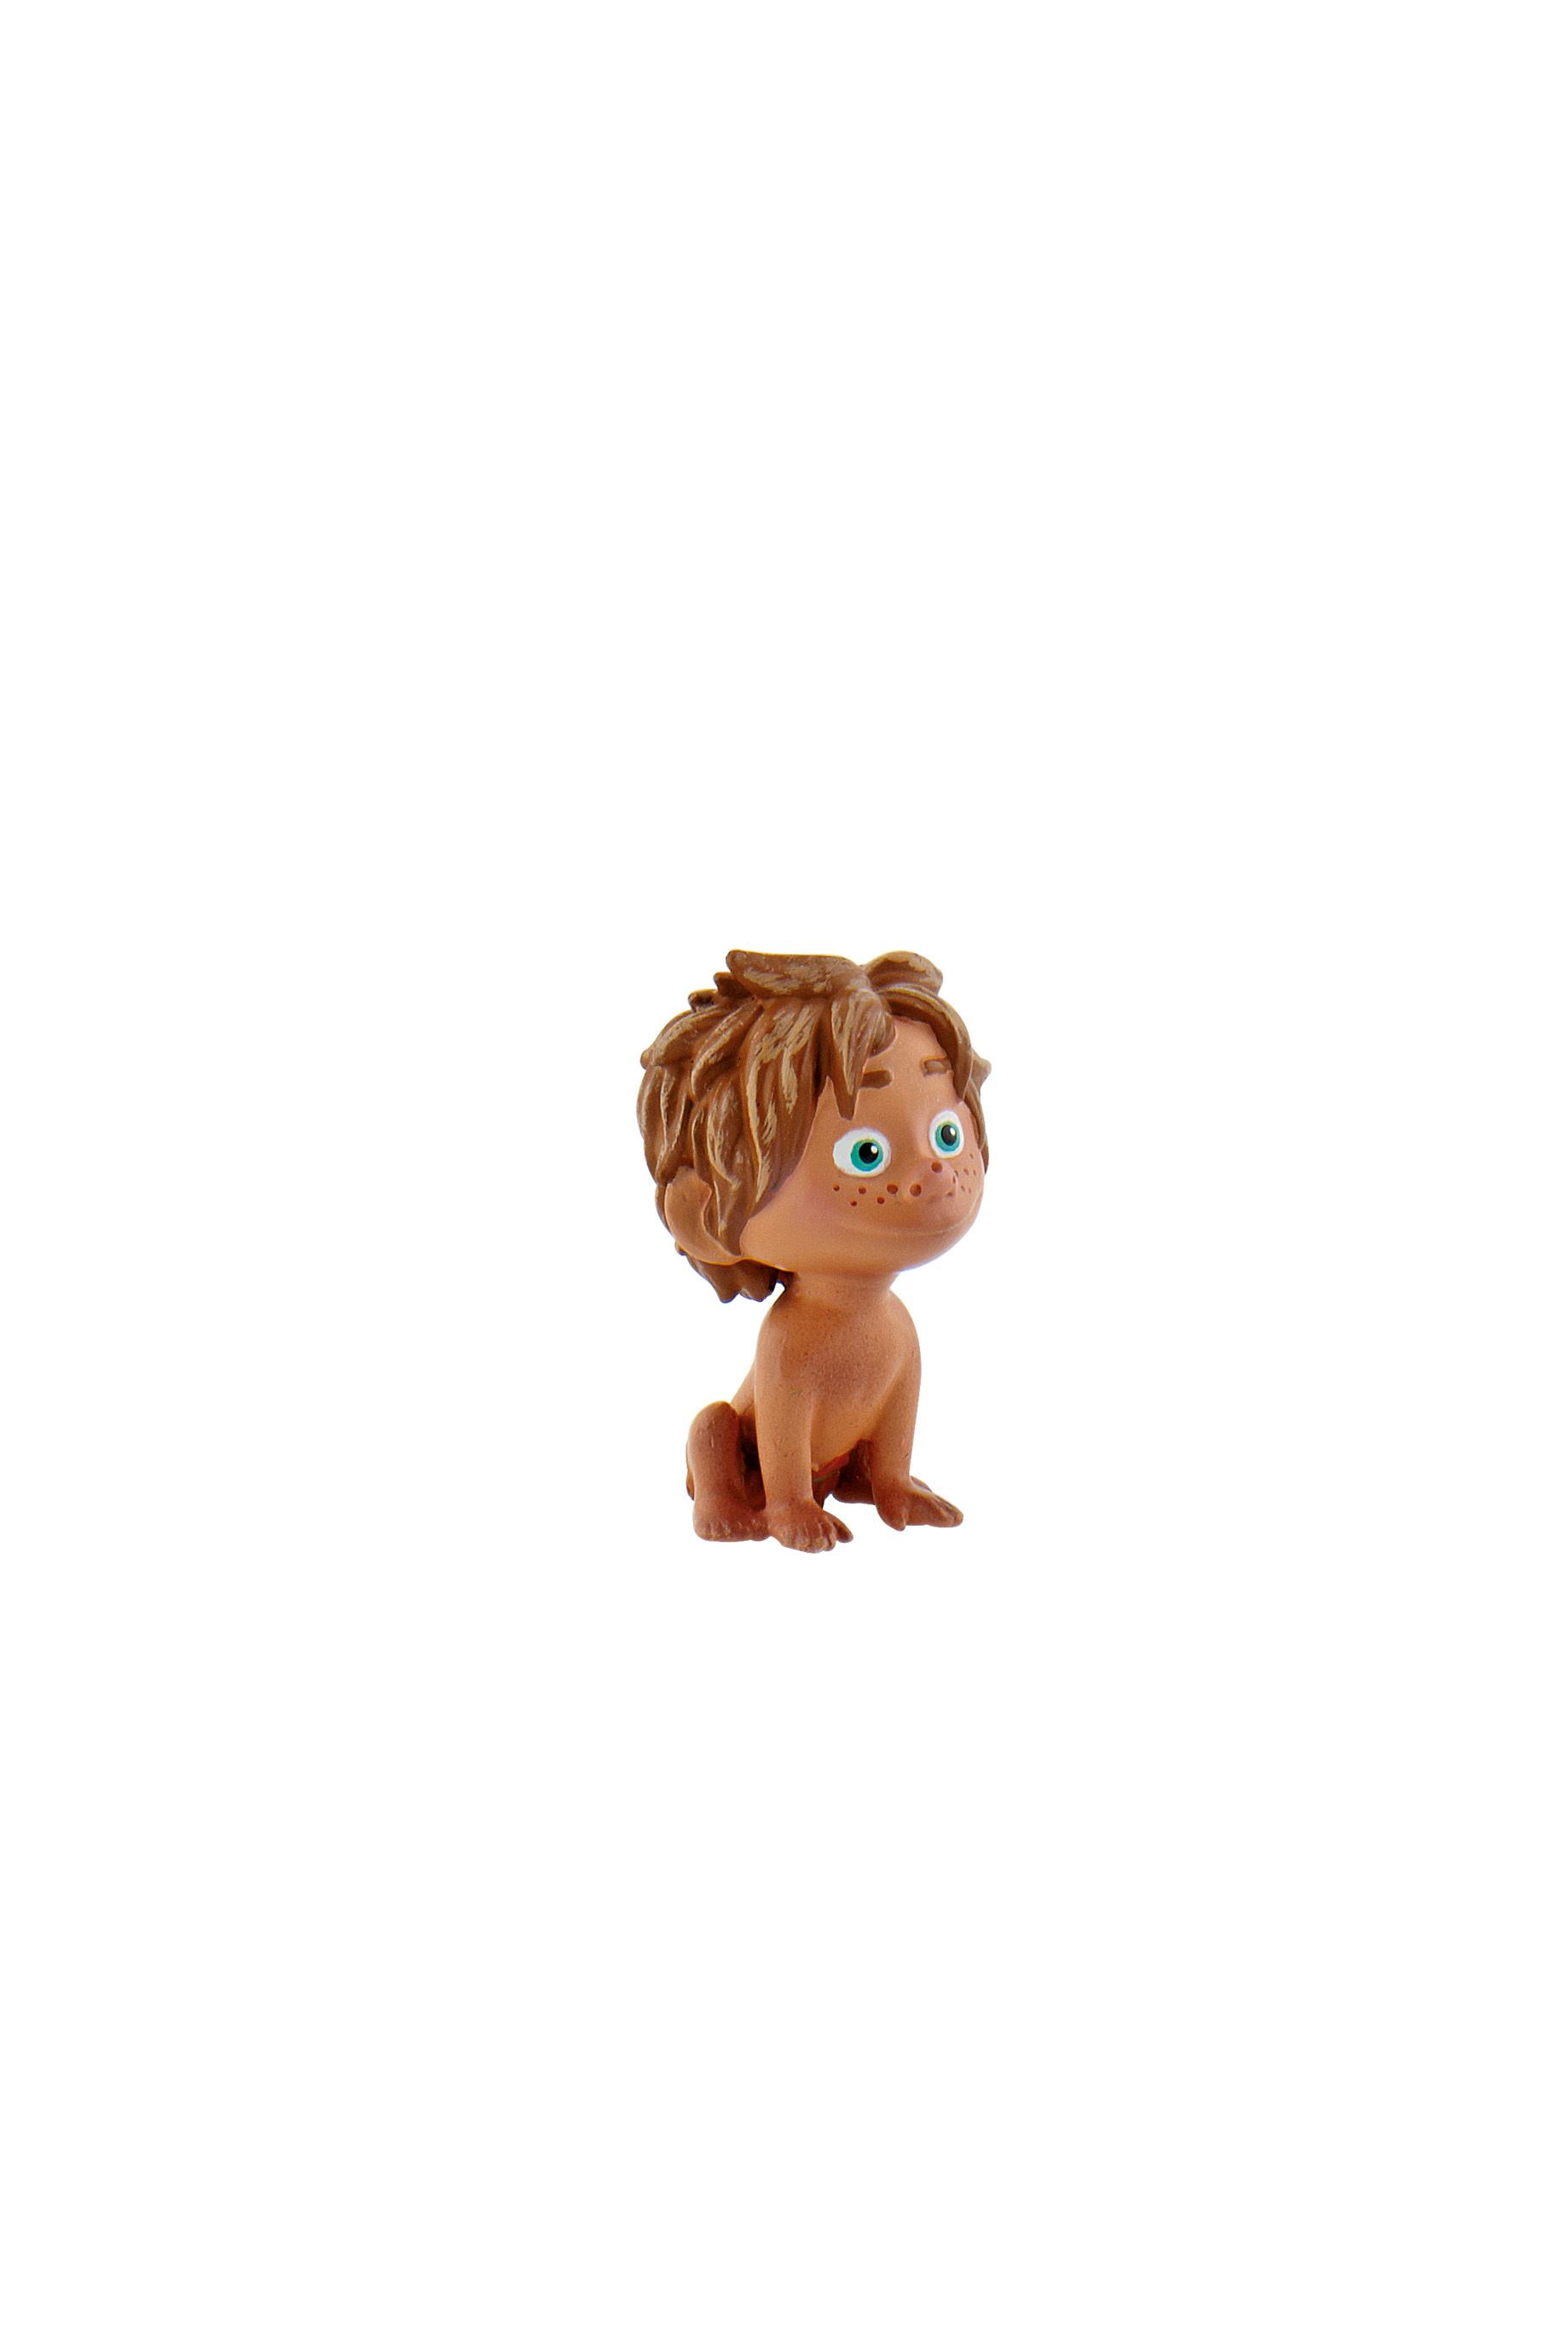 Figurine Le Voyage D'Arlo Disney - Spot - 4 cm